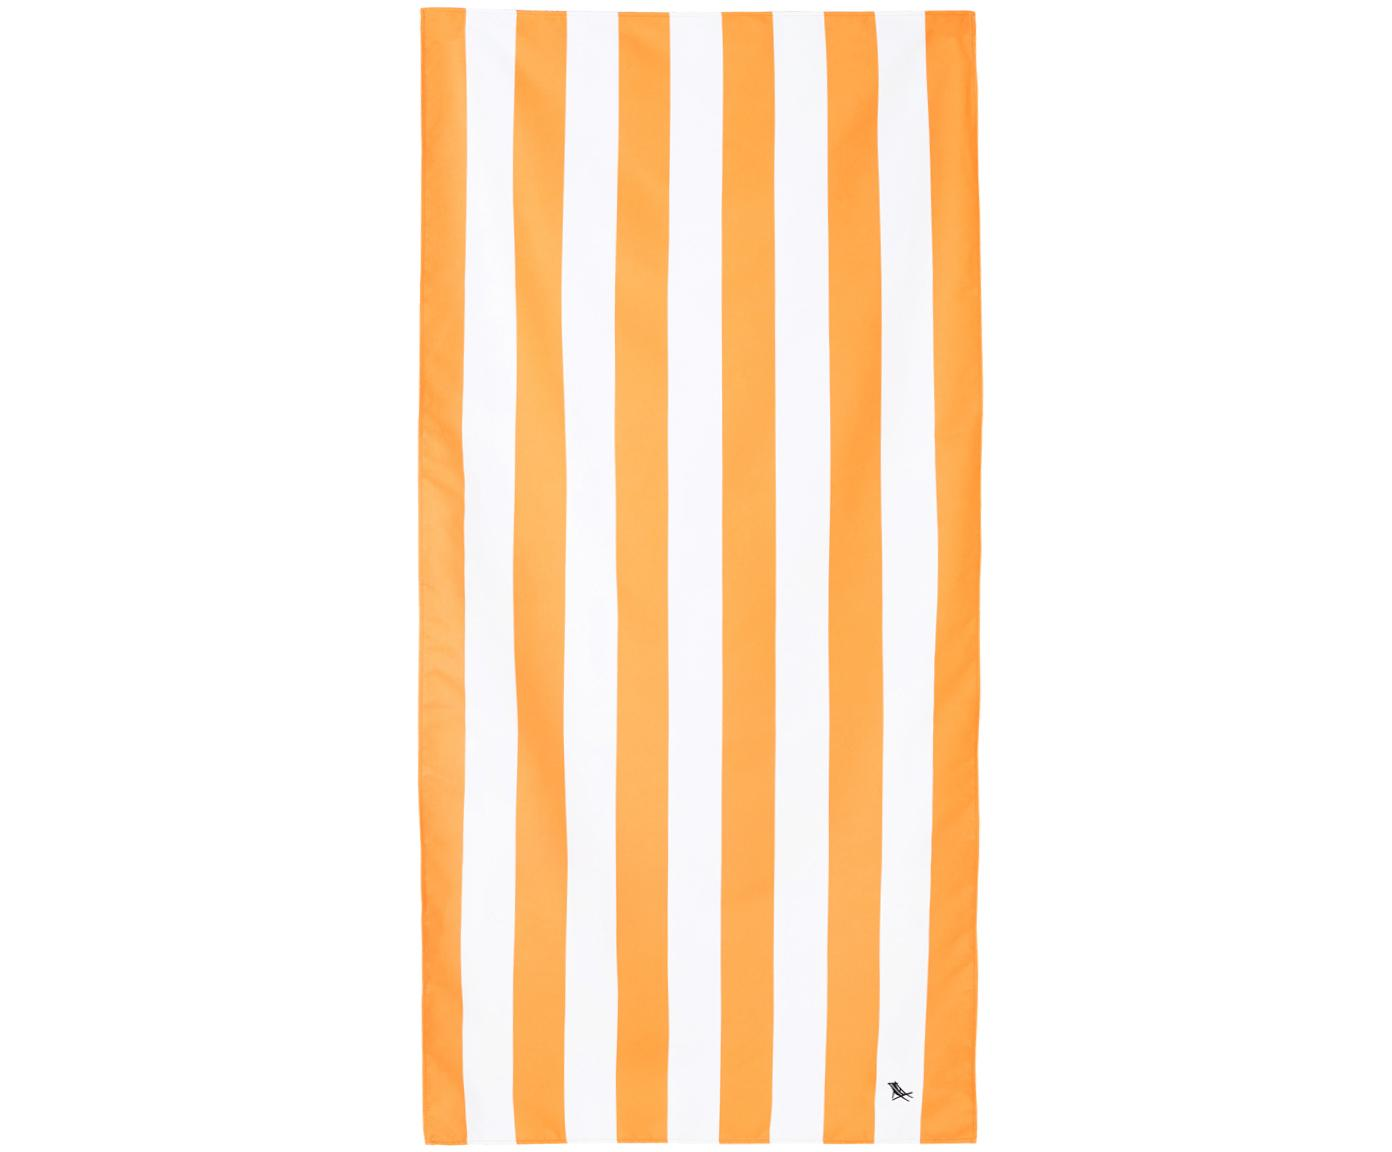 Microvezel strandlaken Cabana, sneldrogend, Microvezels (80% polyester, 20% polyamide), Oranje, wit, 90 x 200 cm